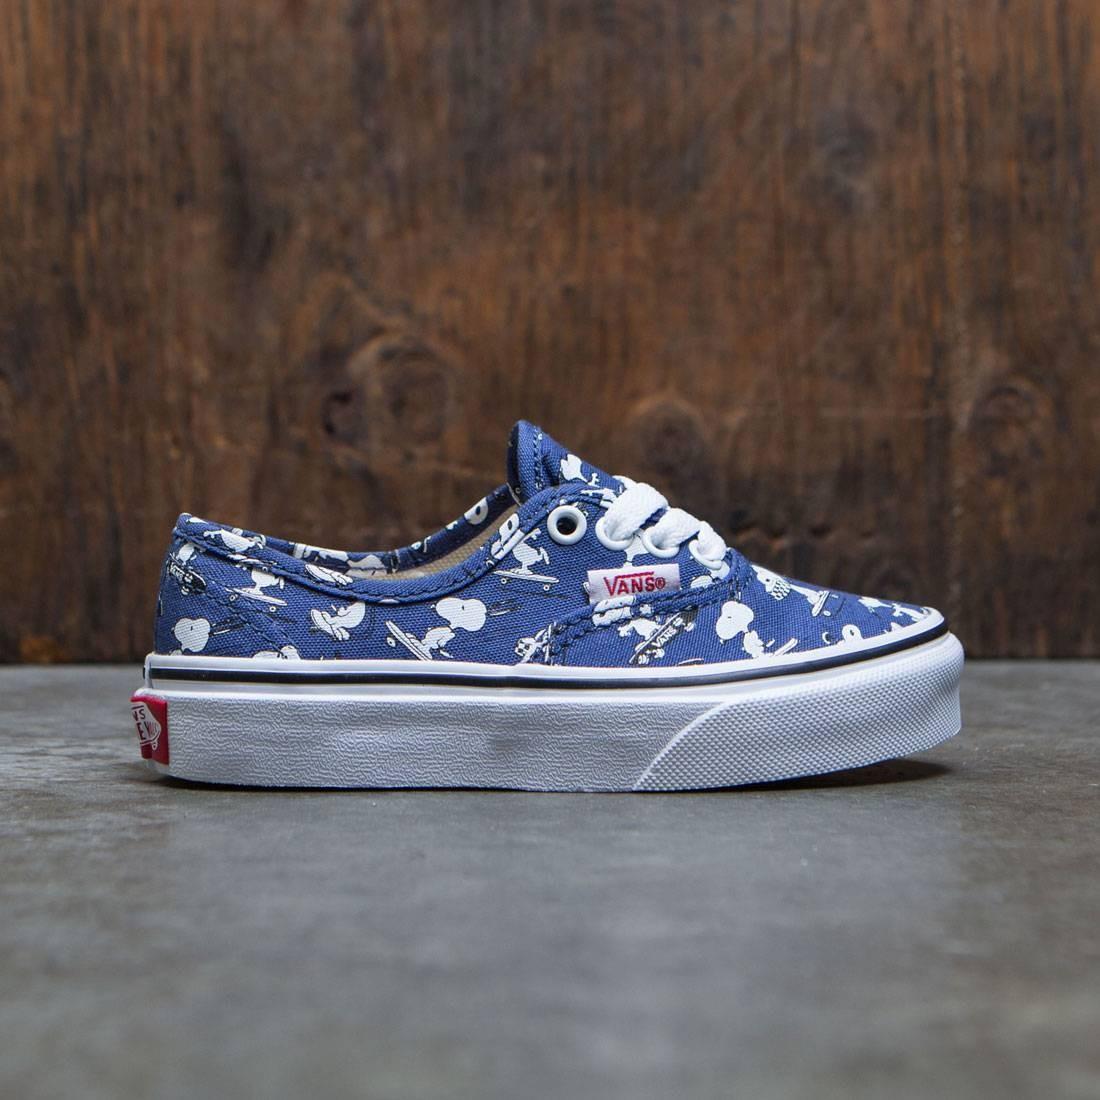 Vans x Peanuts Big Kids Authentic - Snoopy Skating (blue)